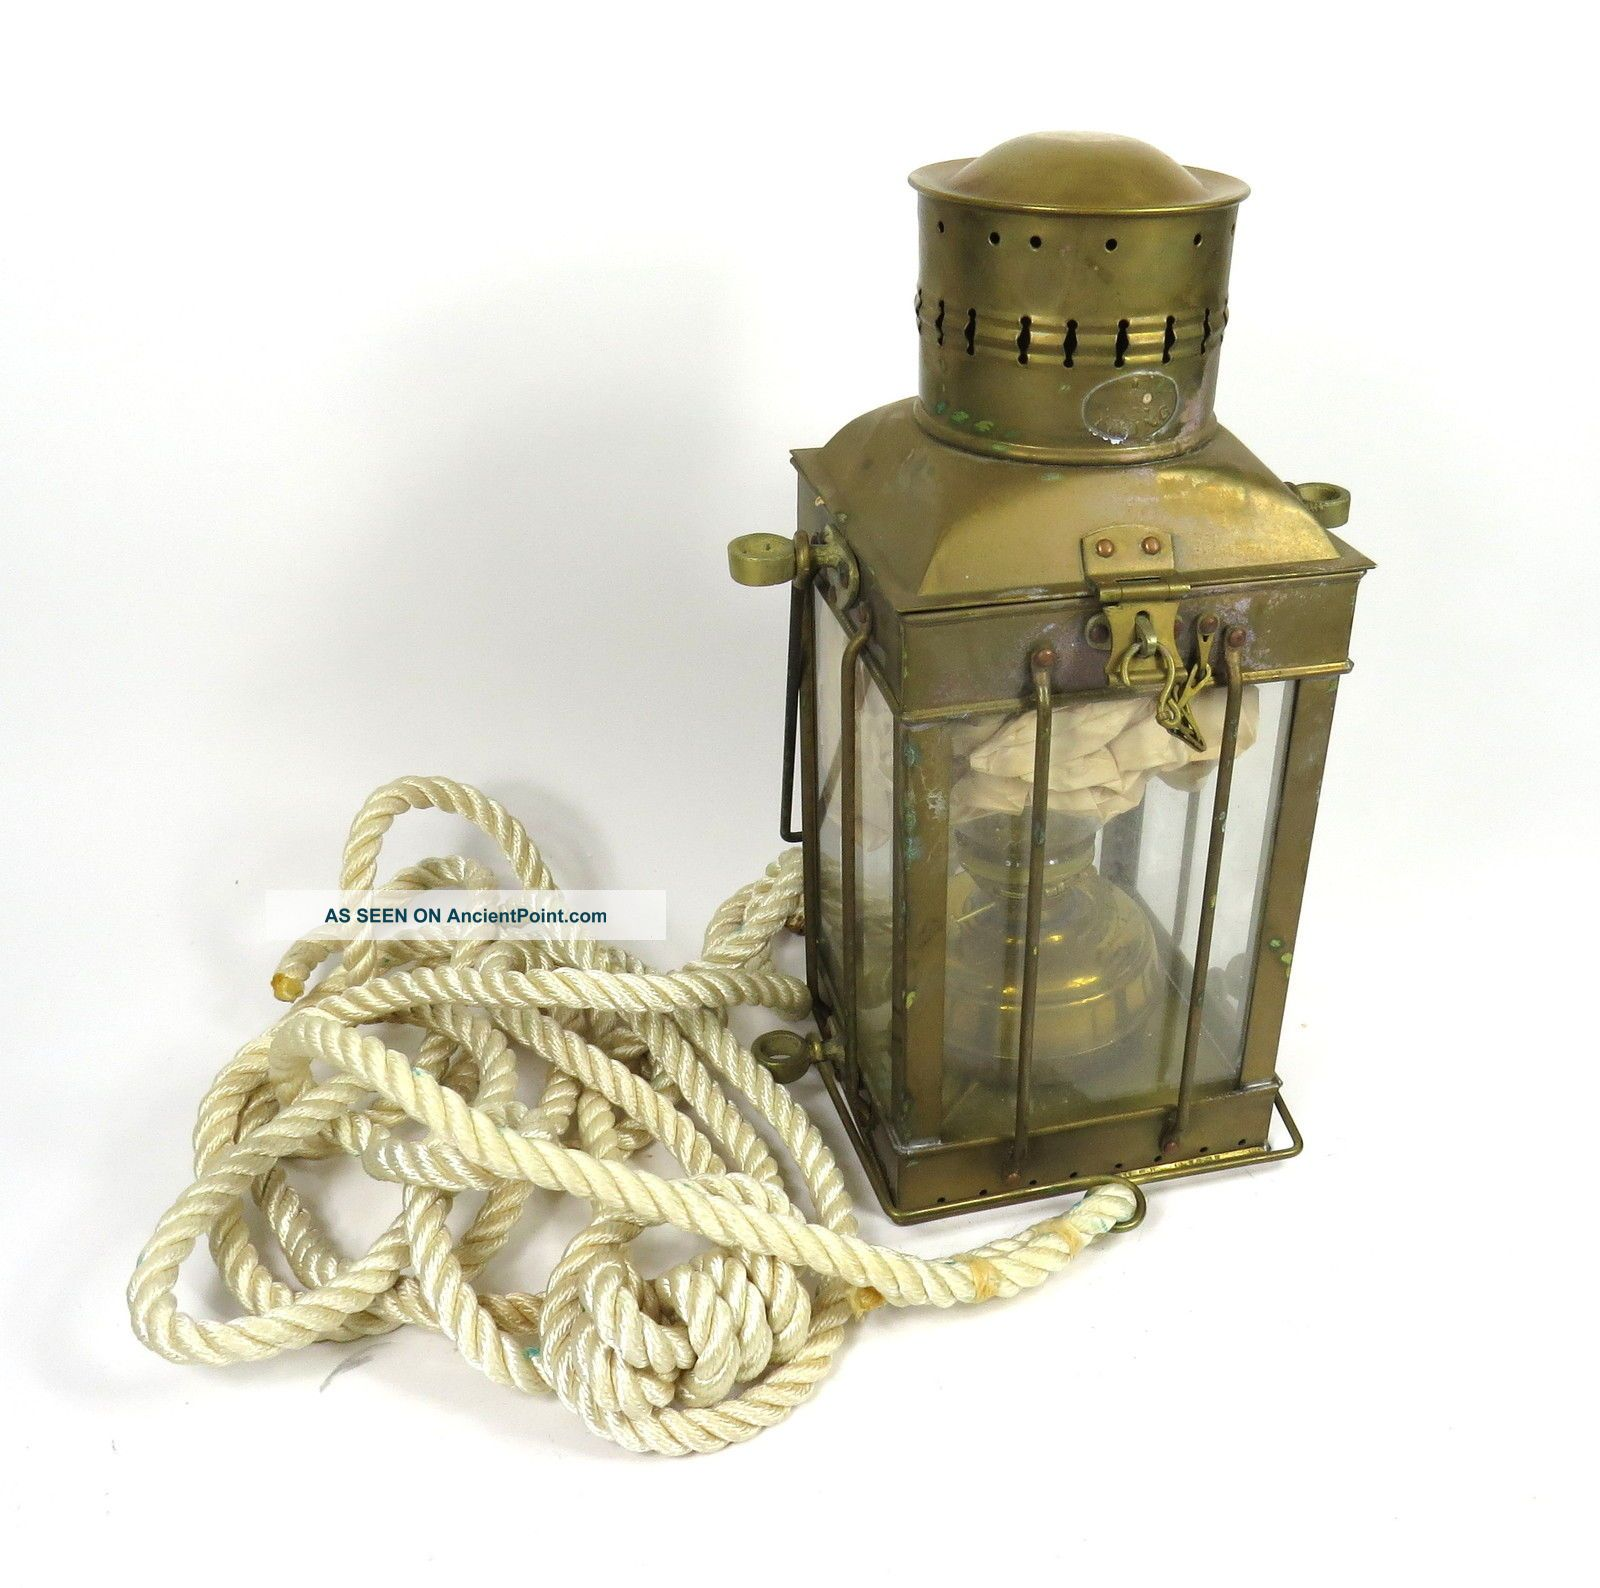 Vintage Viking Brass Nautical Maritime Ship Hanging Oil Lantern With Rope Lamps & Lighting photo